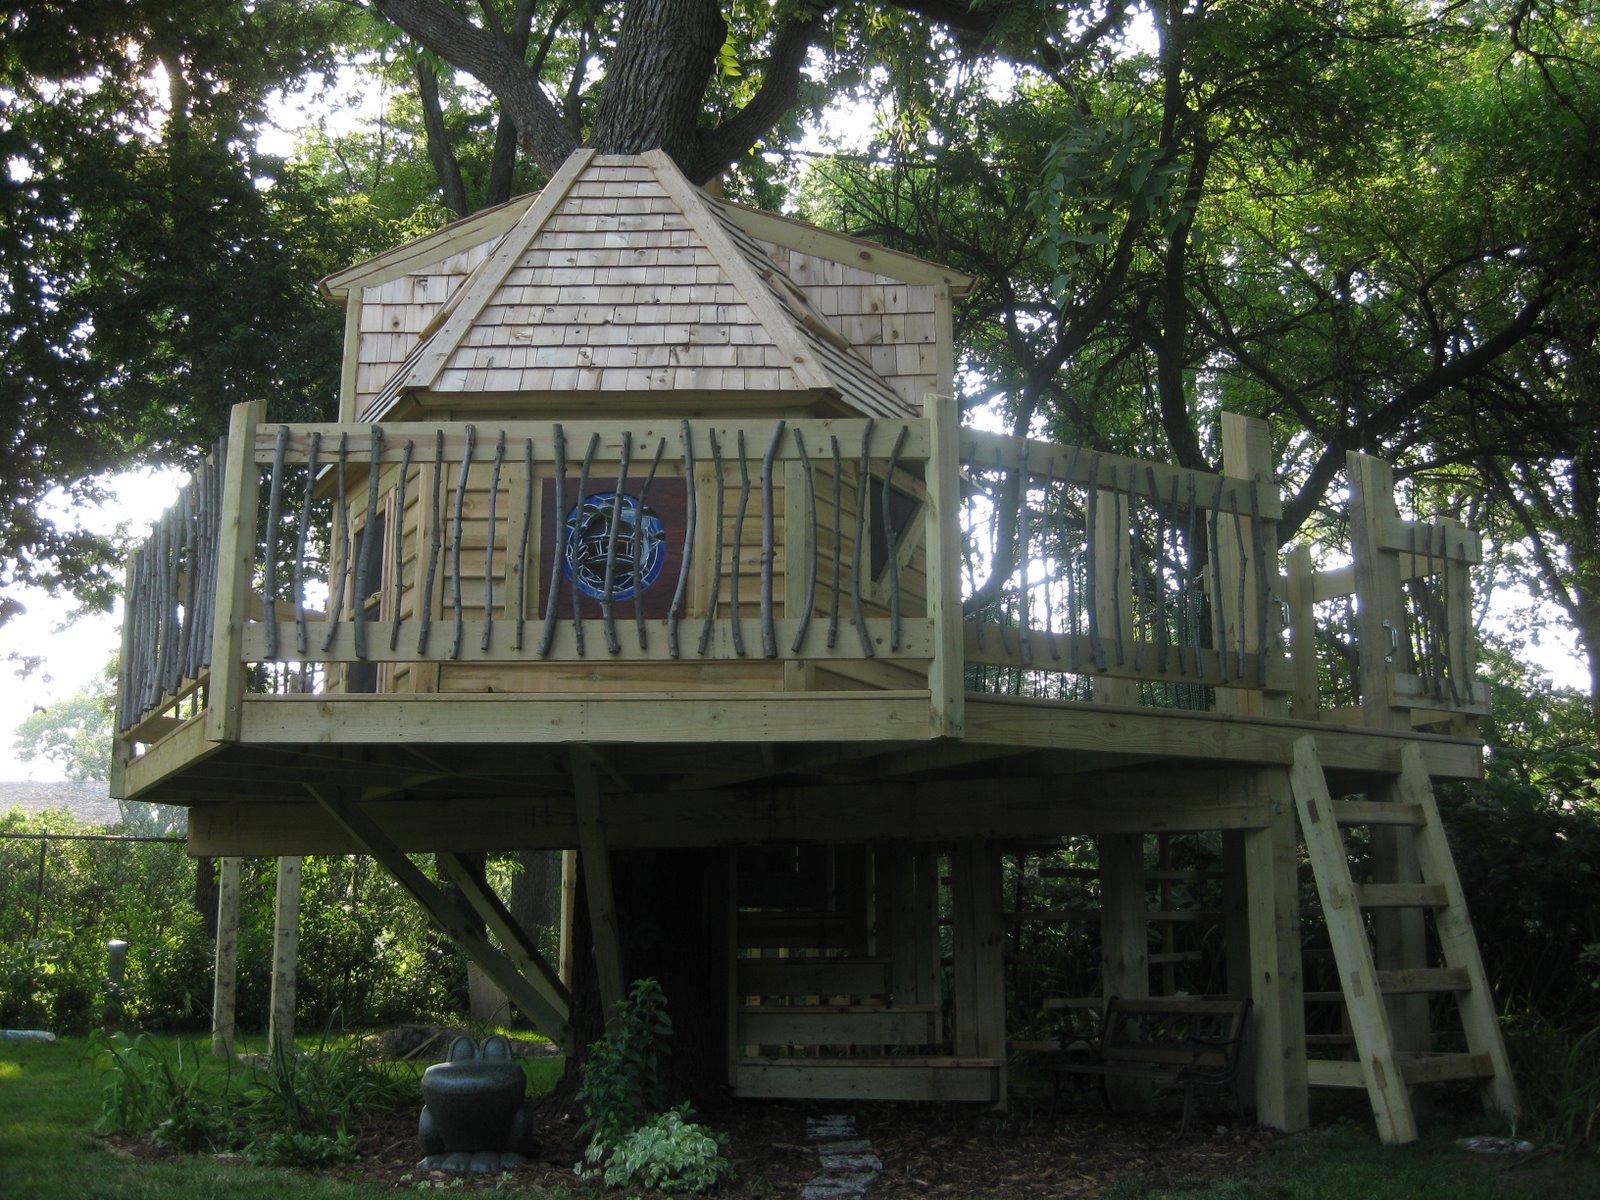 Backyard Playground Surface : Backyard Playground Surface Ideas  Small Backyard Landscaping Ideas